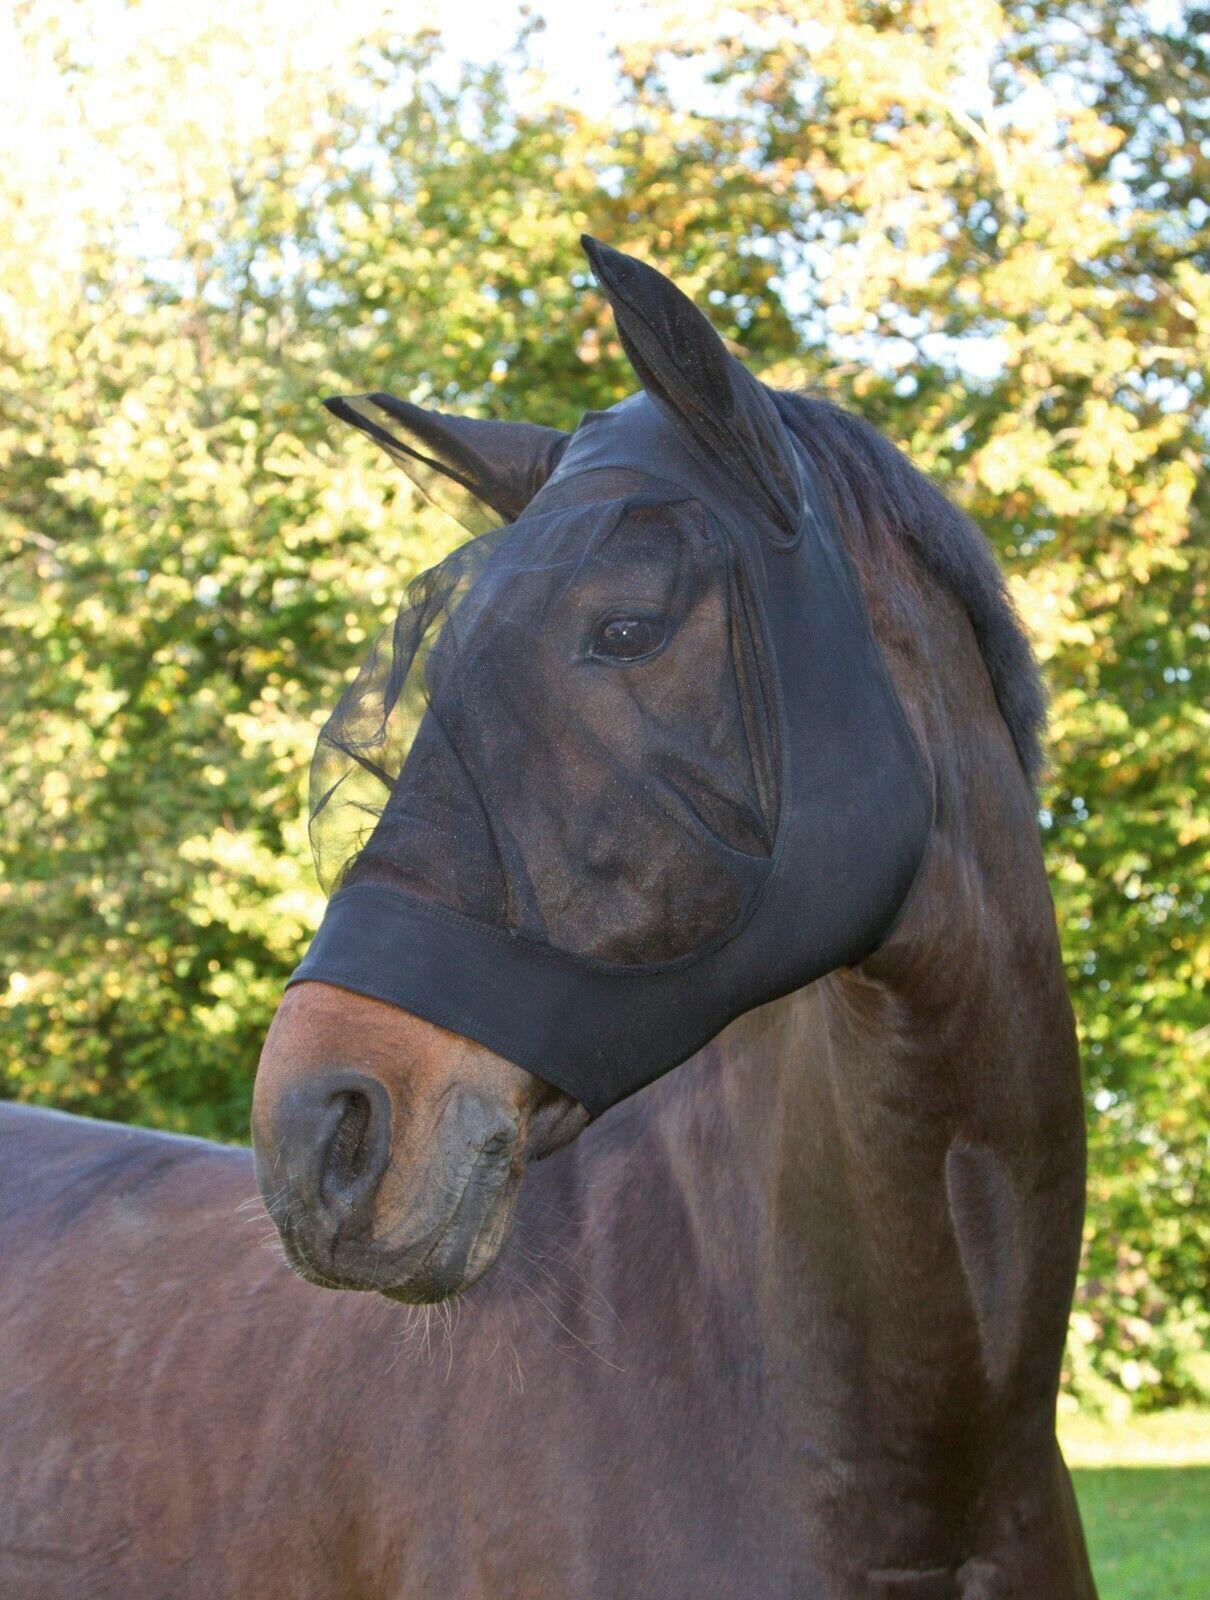 Fliegenschutzmaske Pferd FinoStretch, Full,Cob,Pony, Fliegenhaube schwarz o.blau